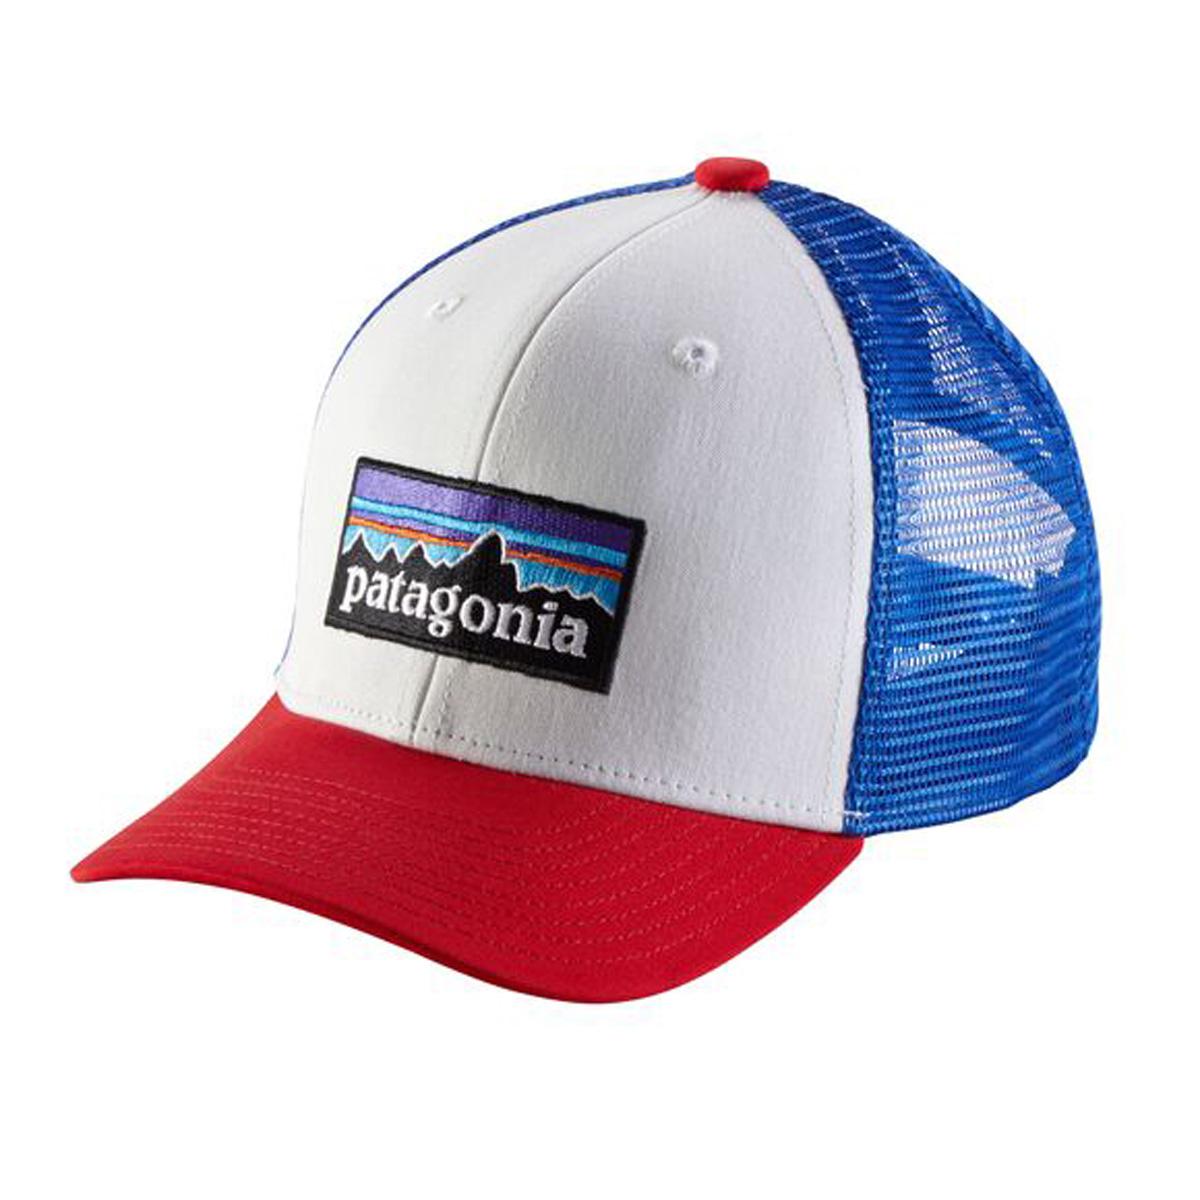 PATAGONIA KID'S TRUCKER HAT (66032)